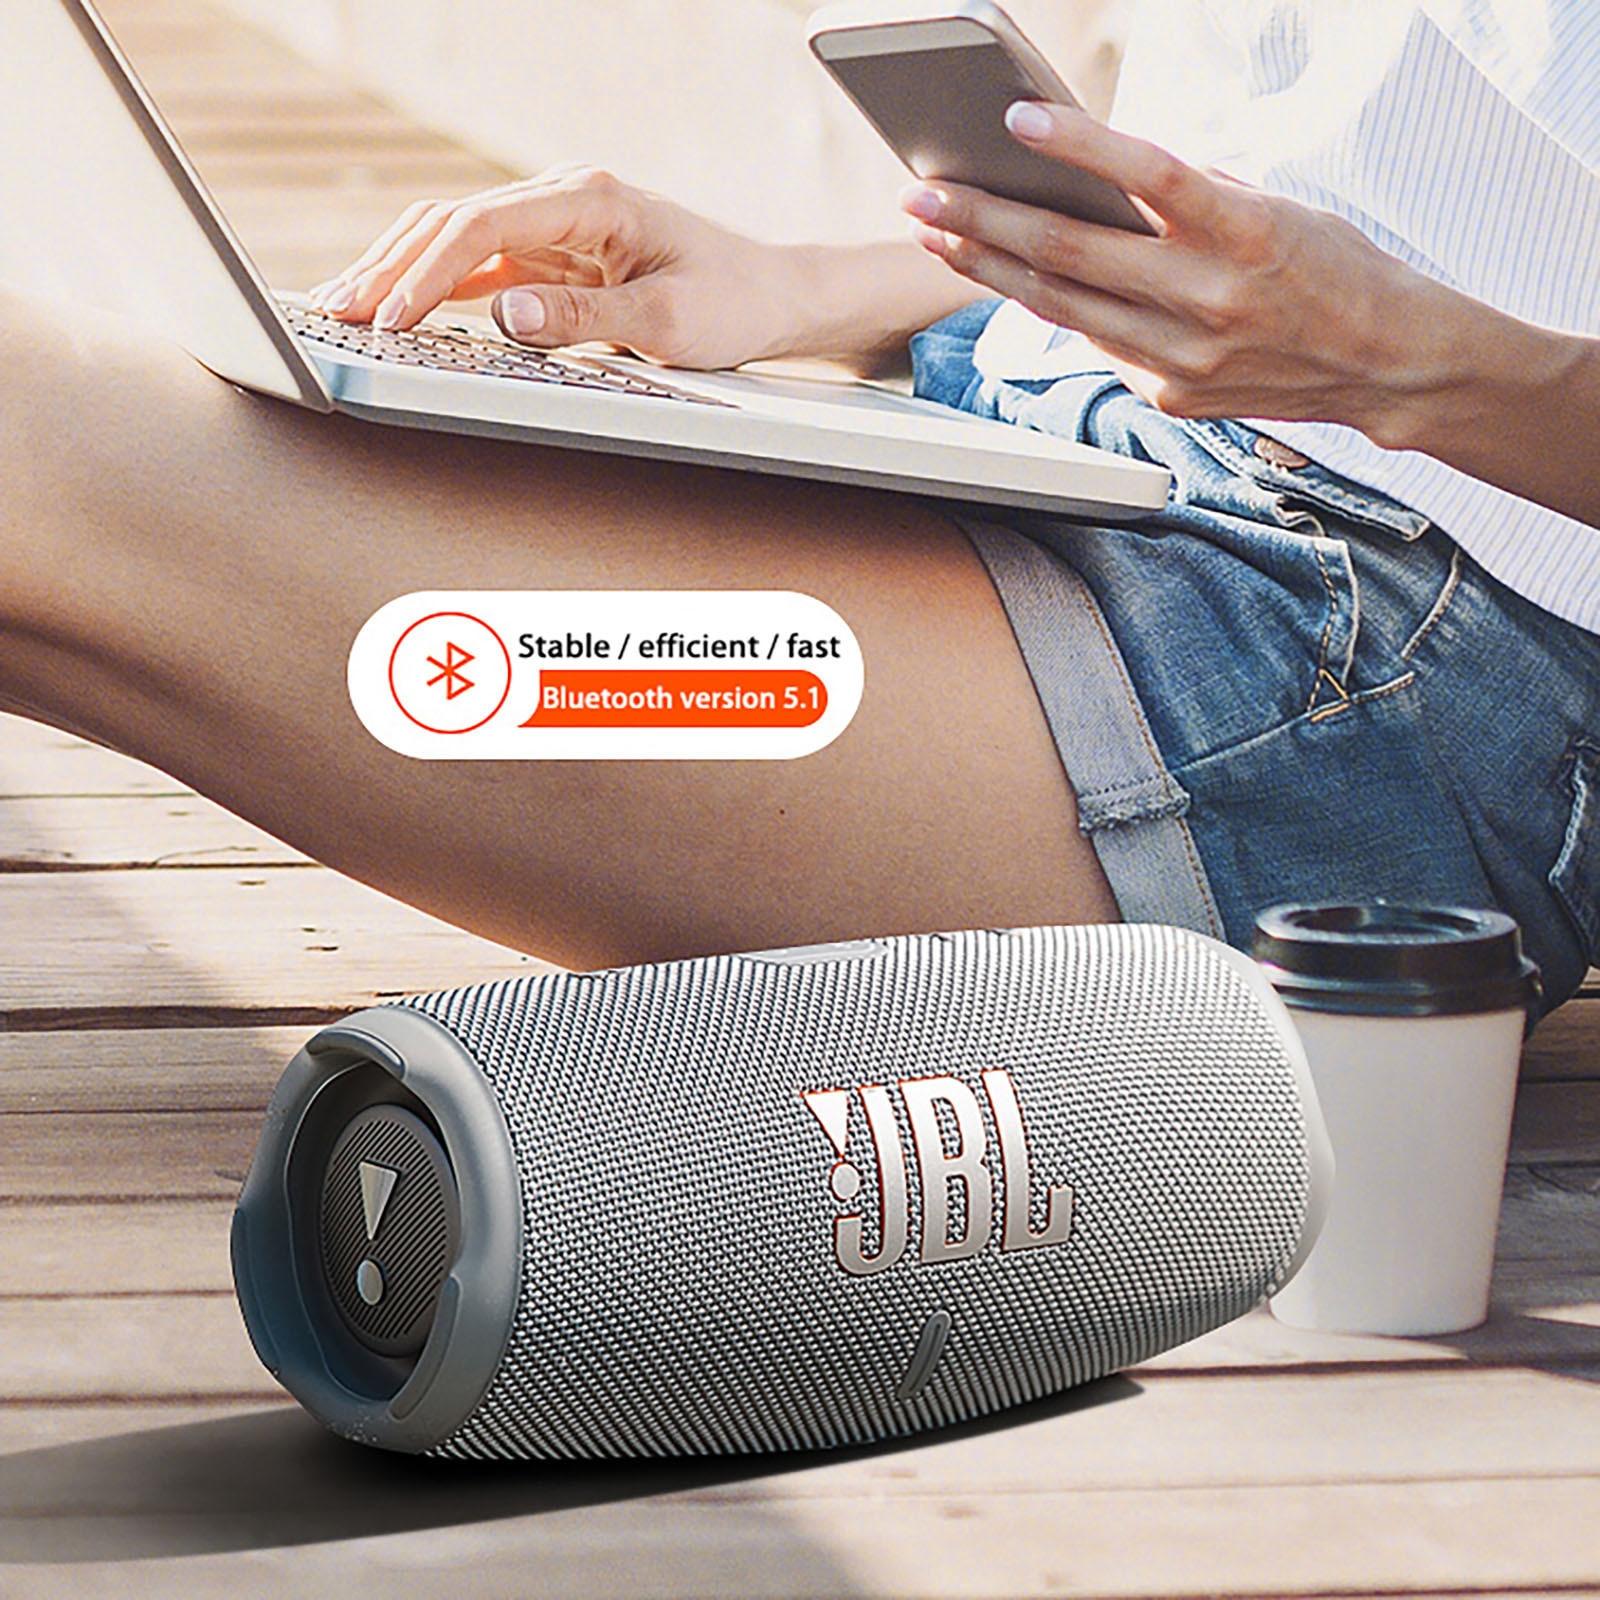 Charge 5 Wireless Bluetooth 5.1 Portable IP67 Waterproof Speaker Portable Speakers Boombox 2 Music Hifi Bass Sound Box Flip